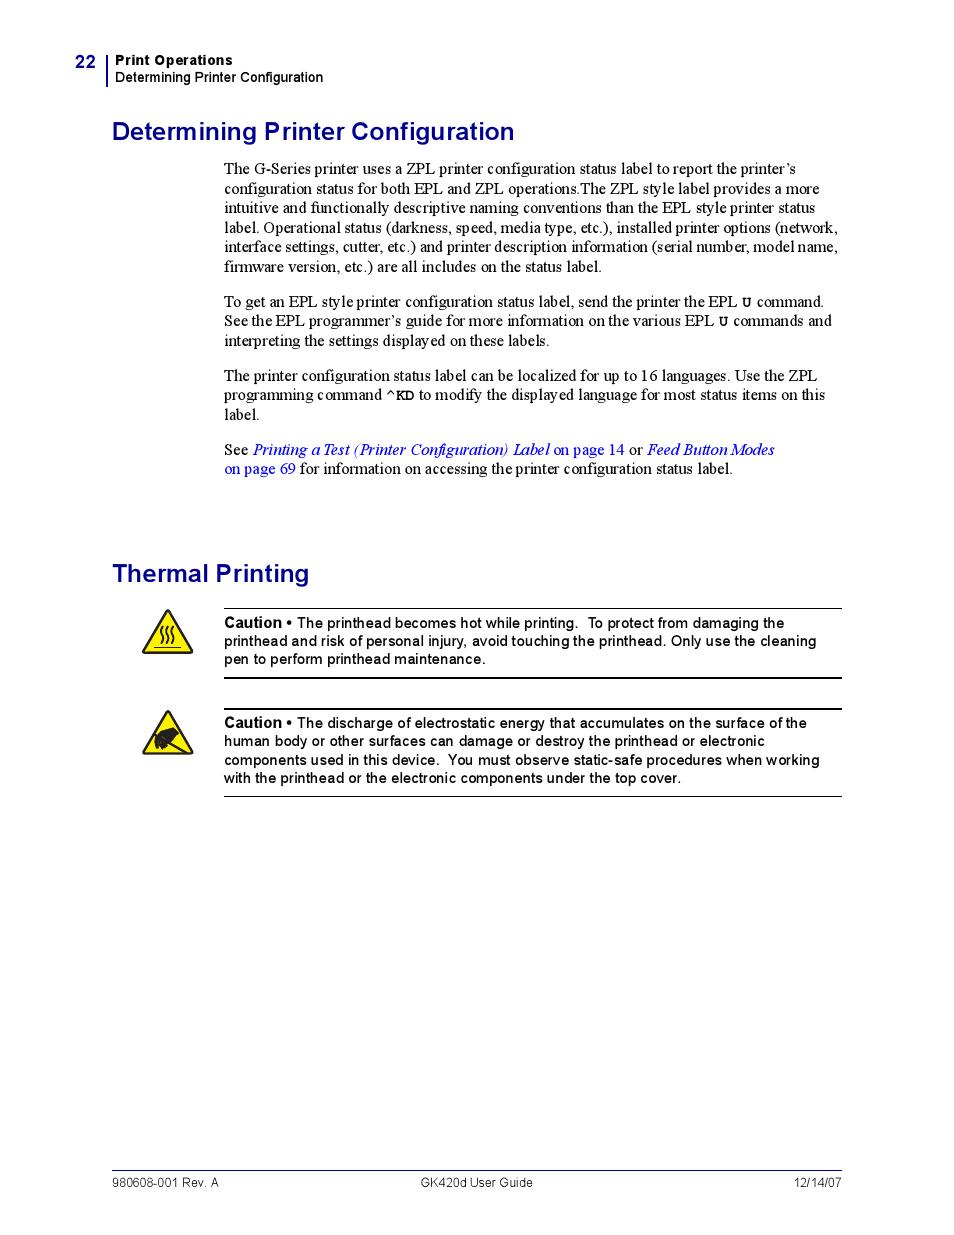 Determining printer configuration, Thermal printing | Rice